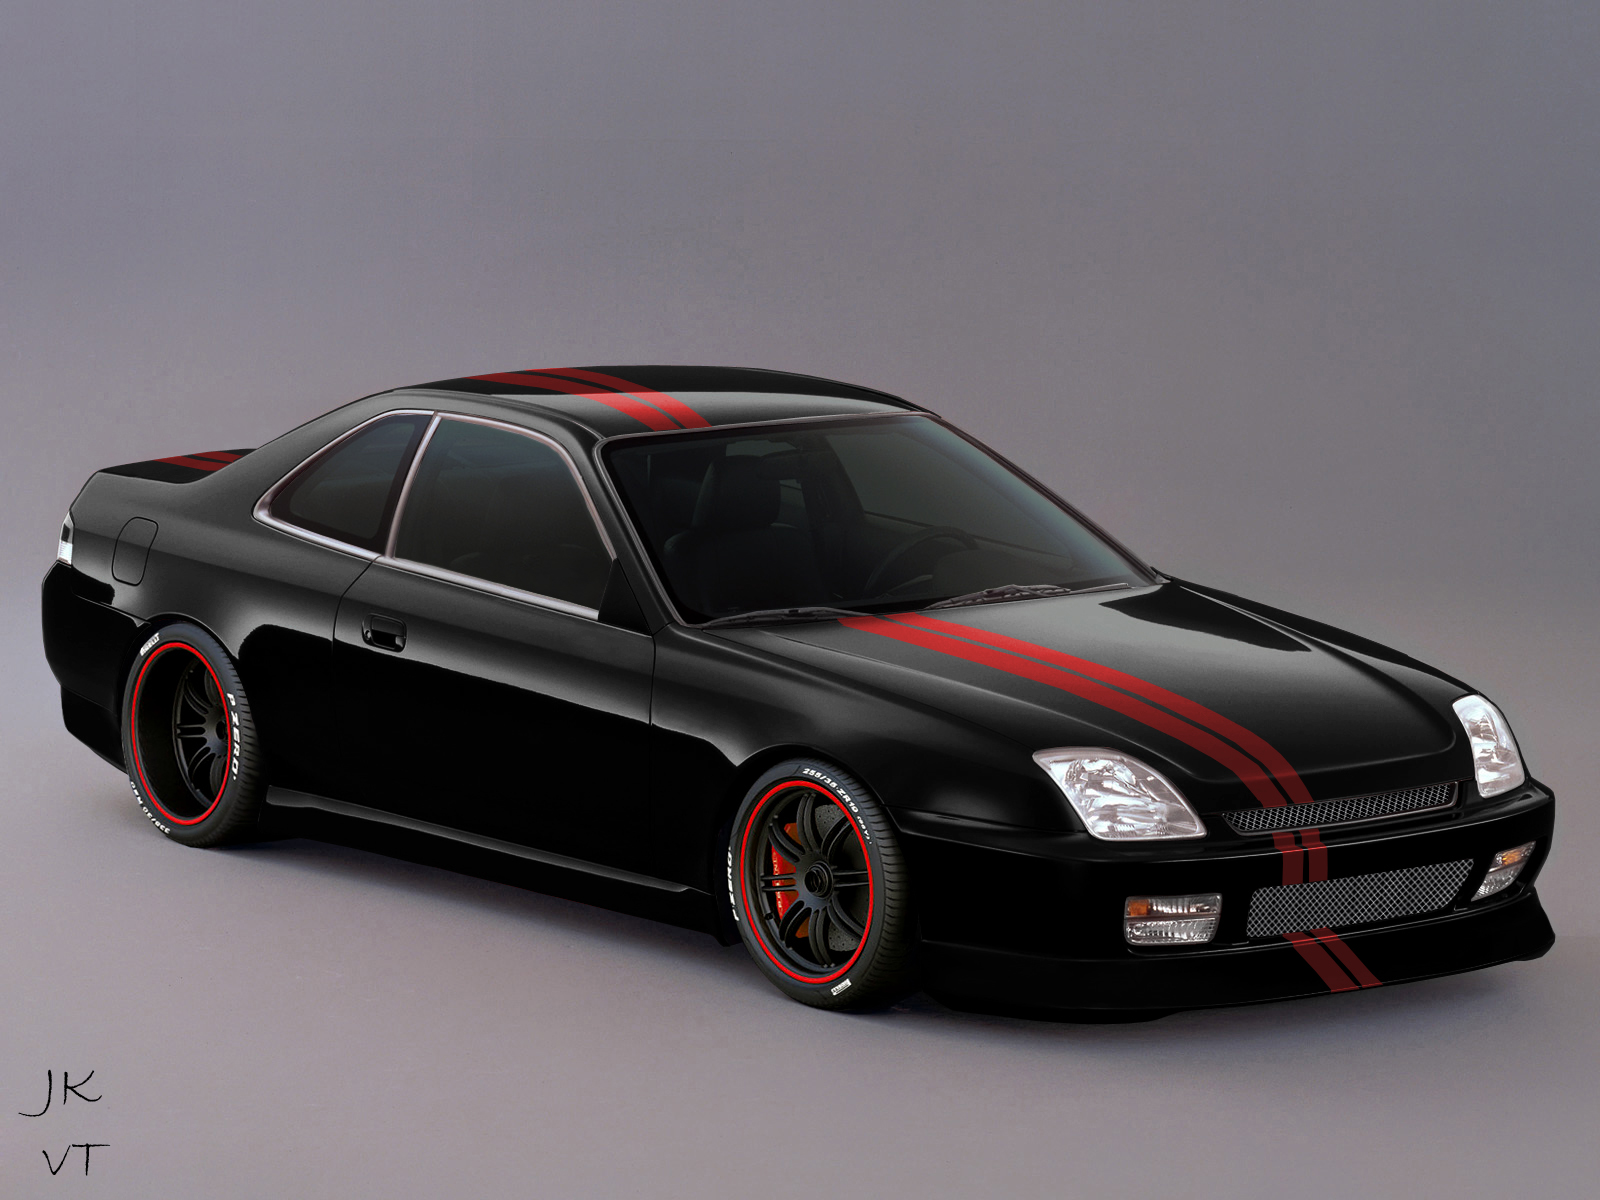 Image Result For Honda Ridgeline Performance Upgrades